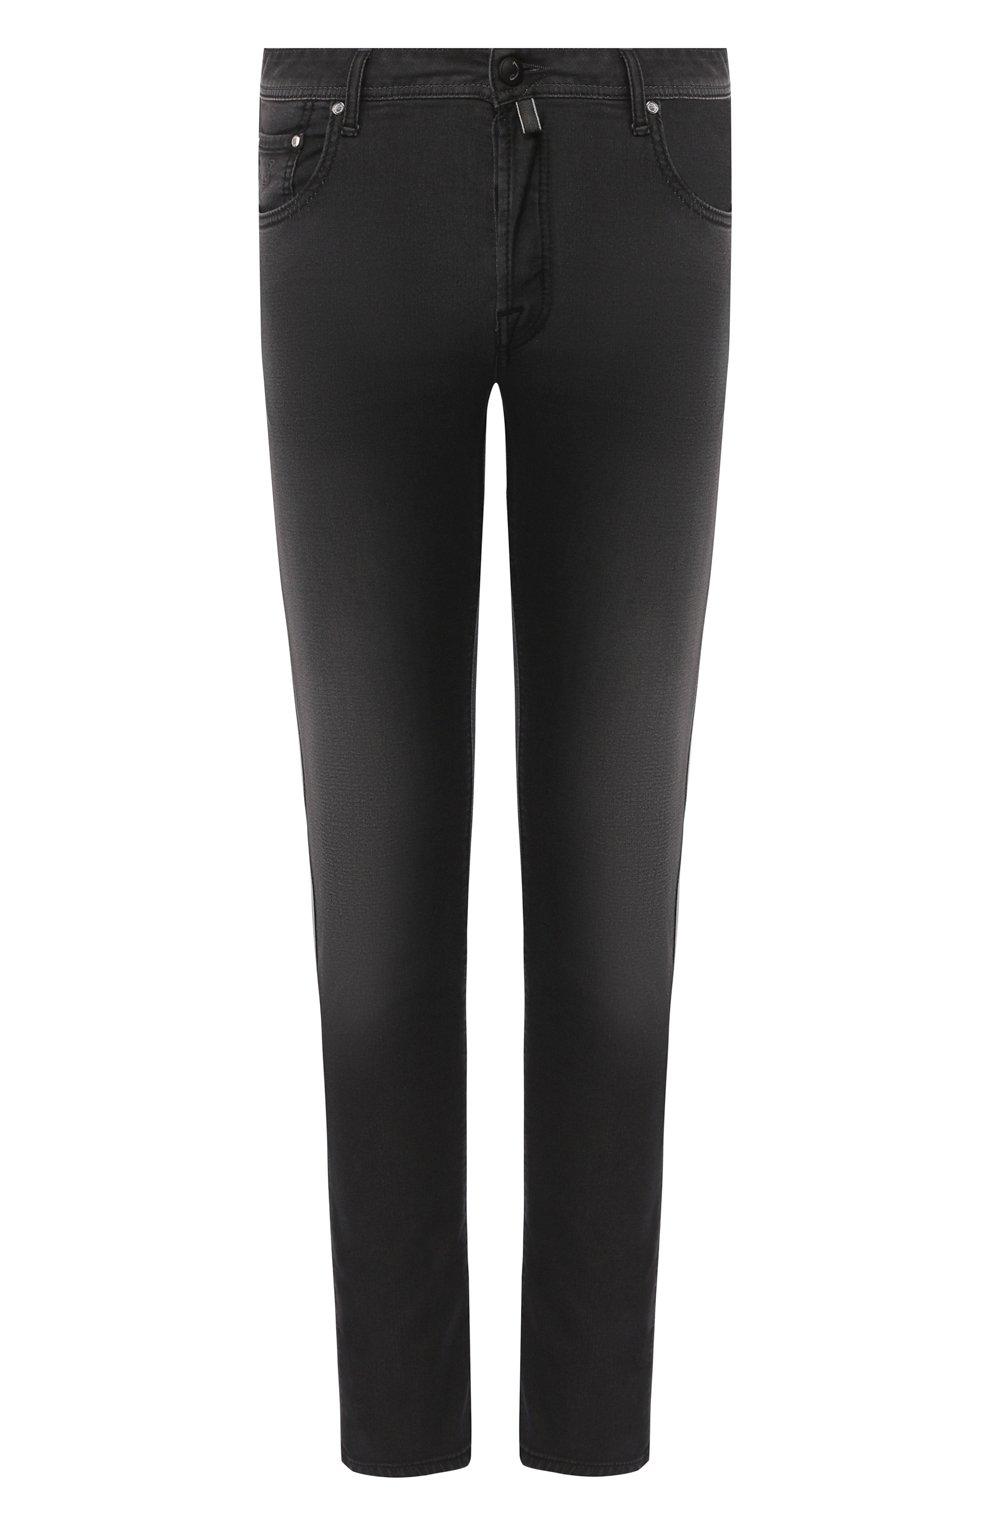 Мужские джинсы JACOB COHEN черного цвета, арт. J688 C0MF 01841-W1/53   Фото 1